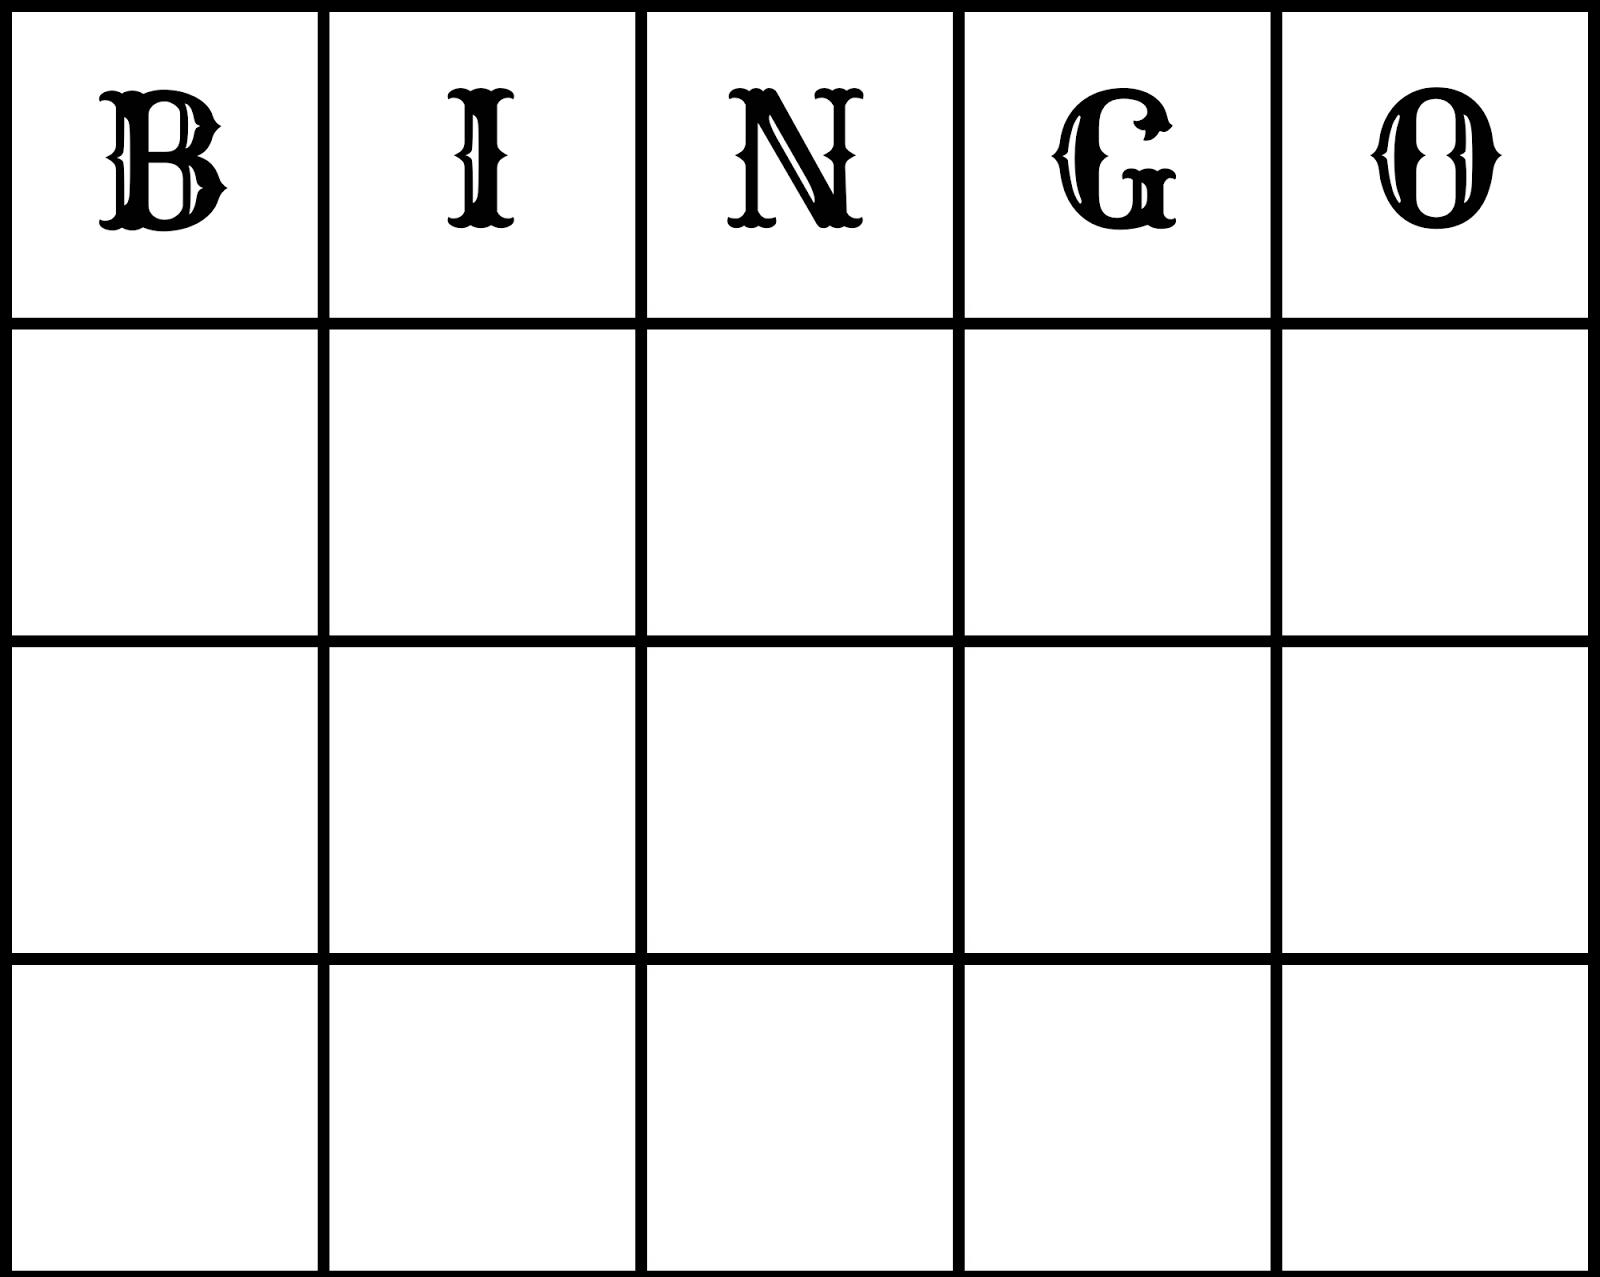 Printable Blank Bingo Board Game Pictures to Pin – Blank Bingo Template